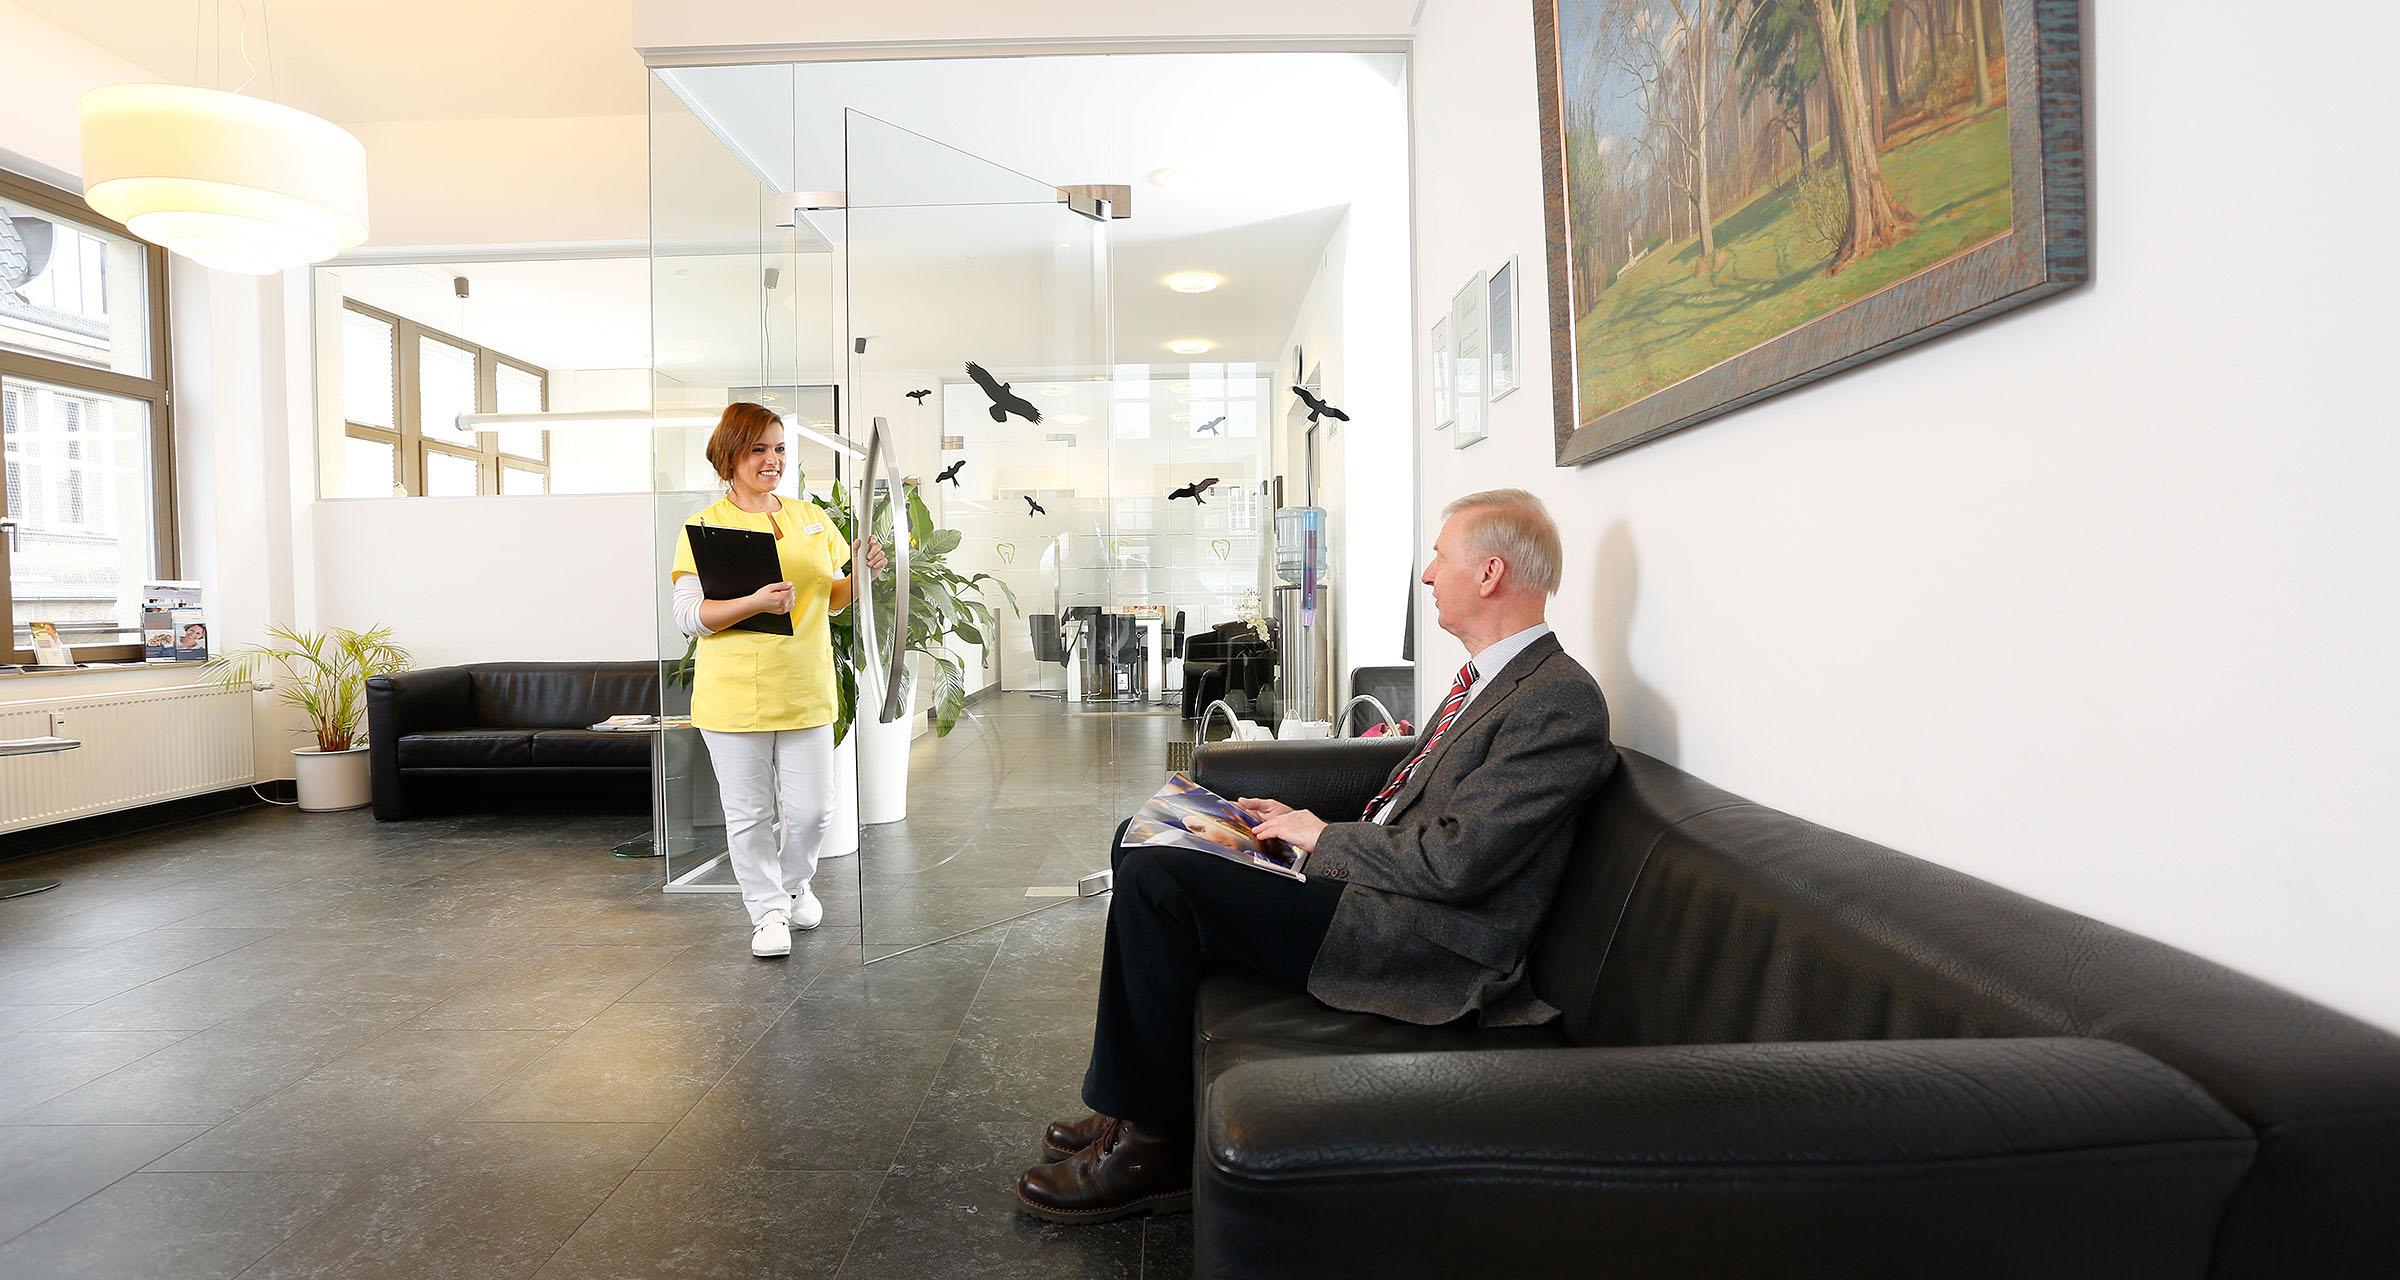 datenschutz zahnarztpraxis hesse in hannover. Black Bedroom Furniture Sets. Home Design Ideas